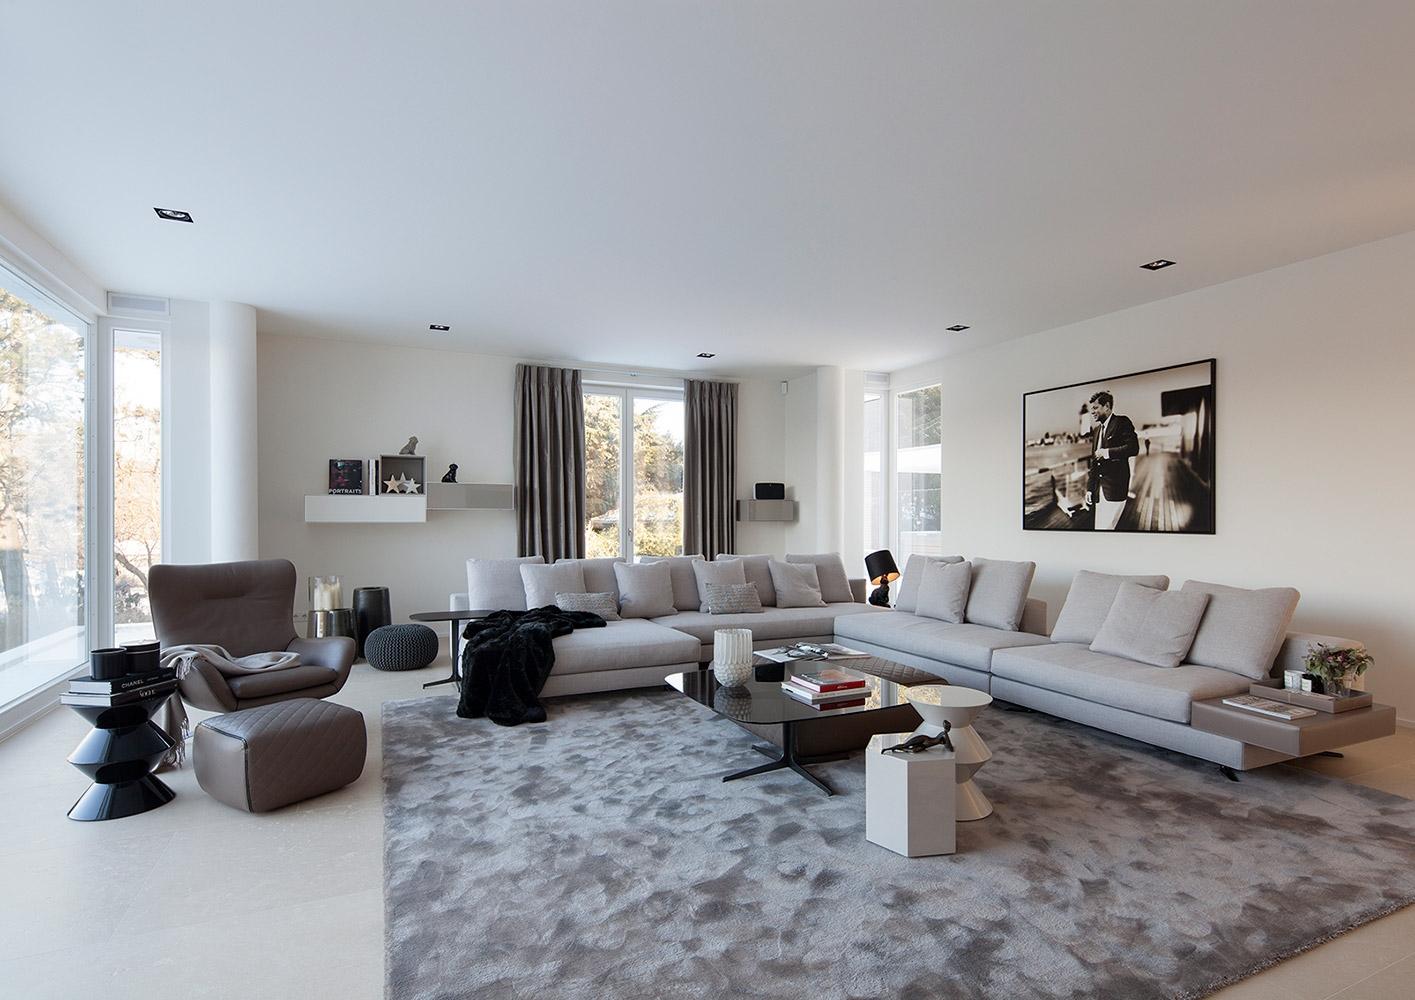 francoforte villa faller interiors contract it. Black Bedroom Furniture Sets. Home Design Ideas